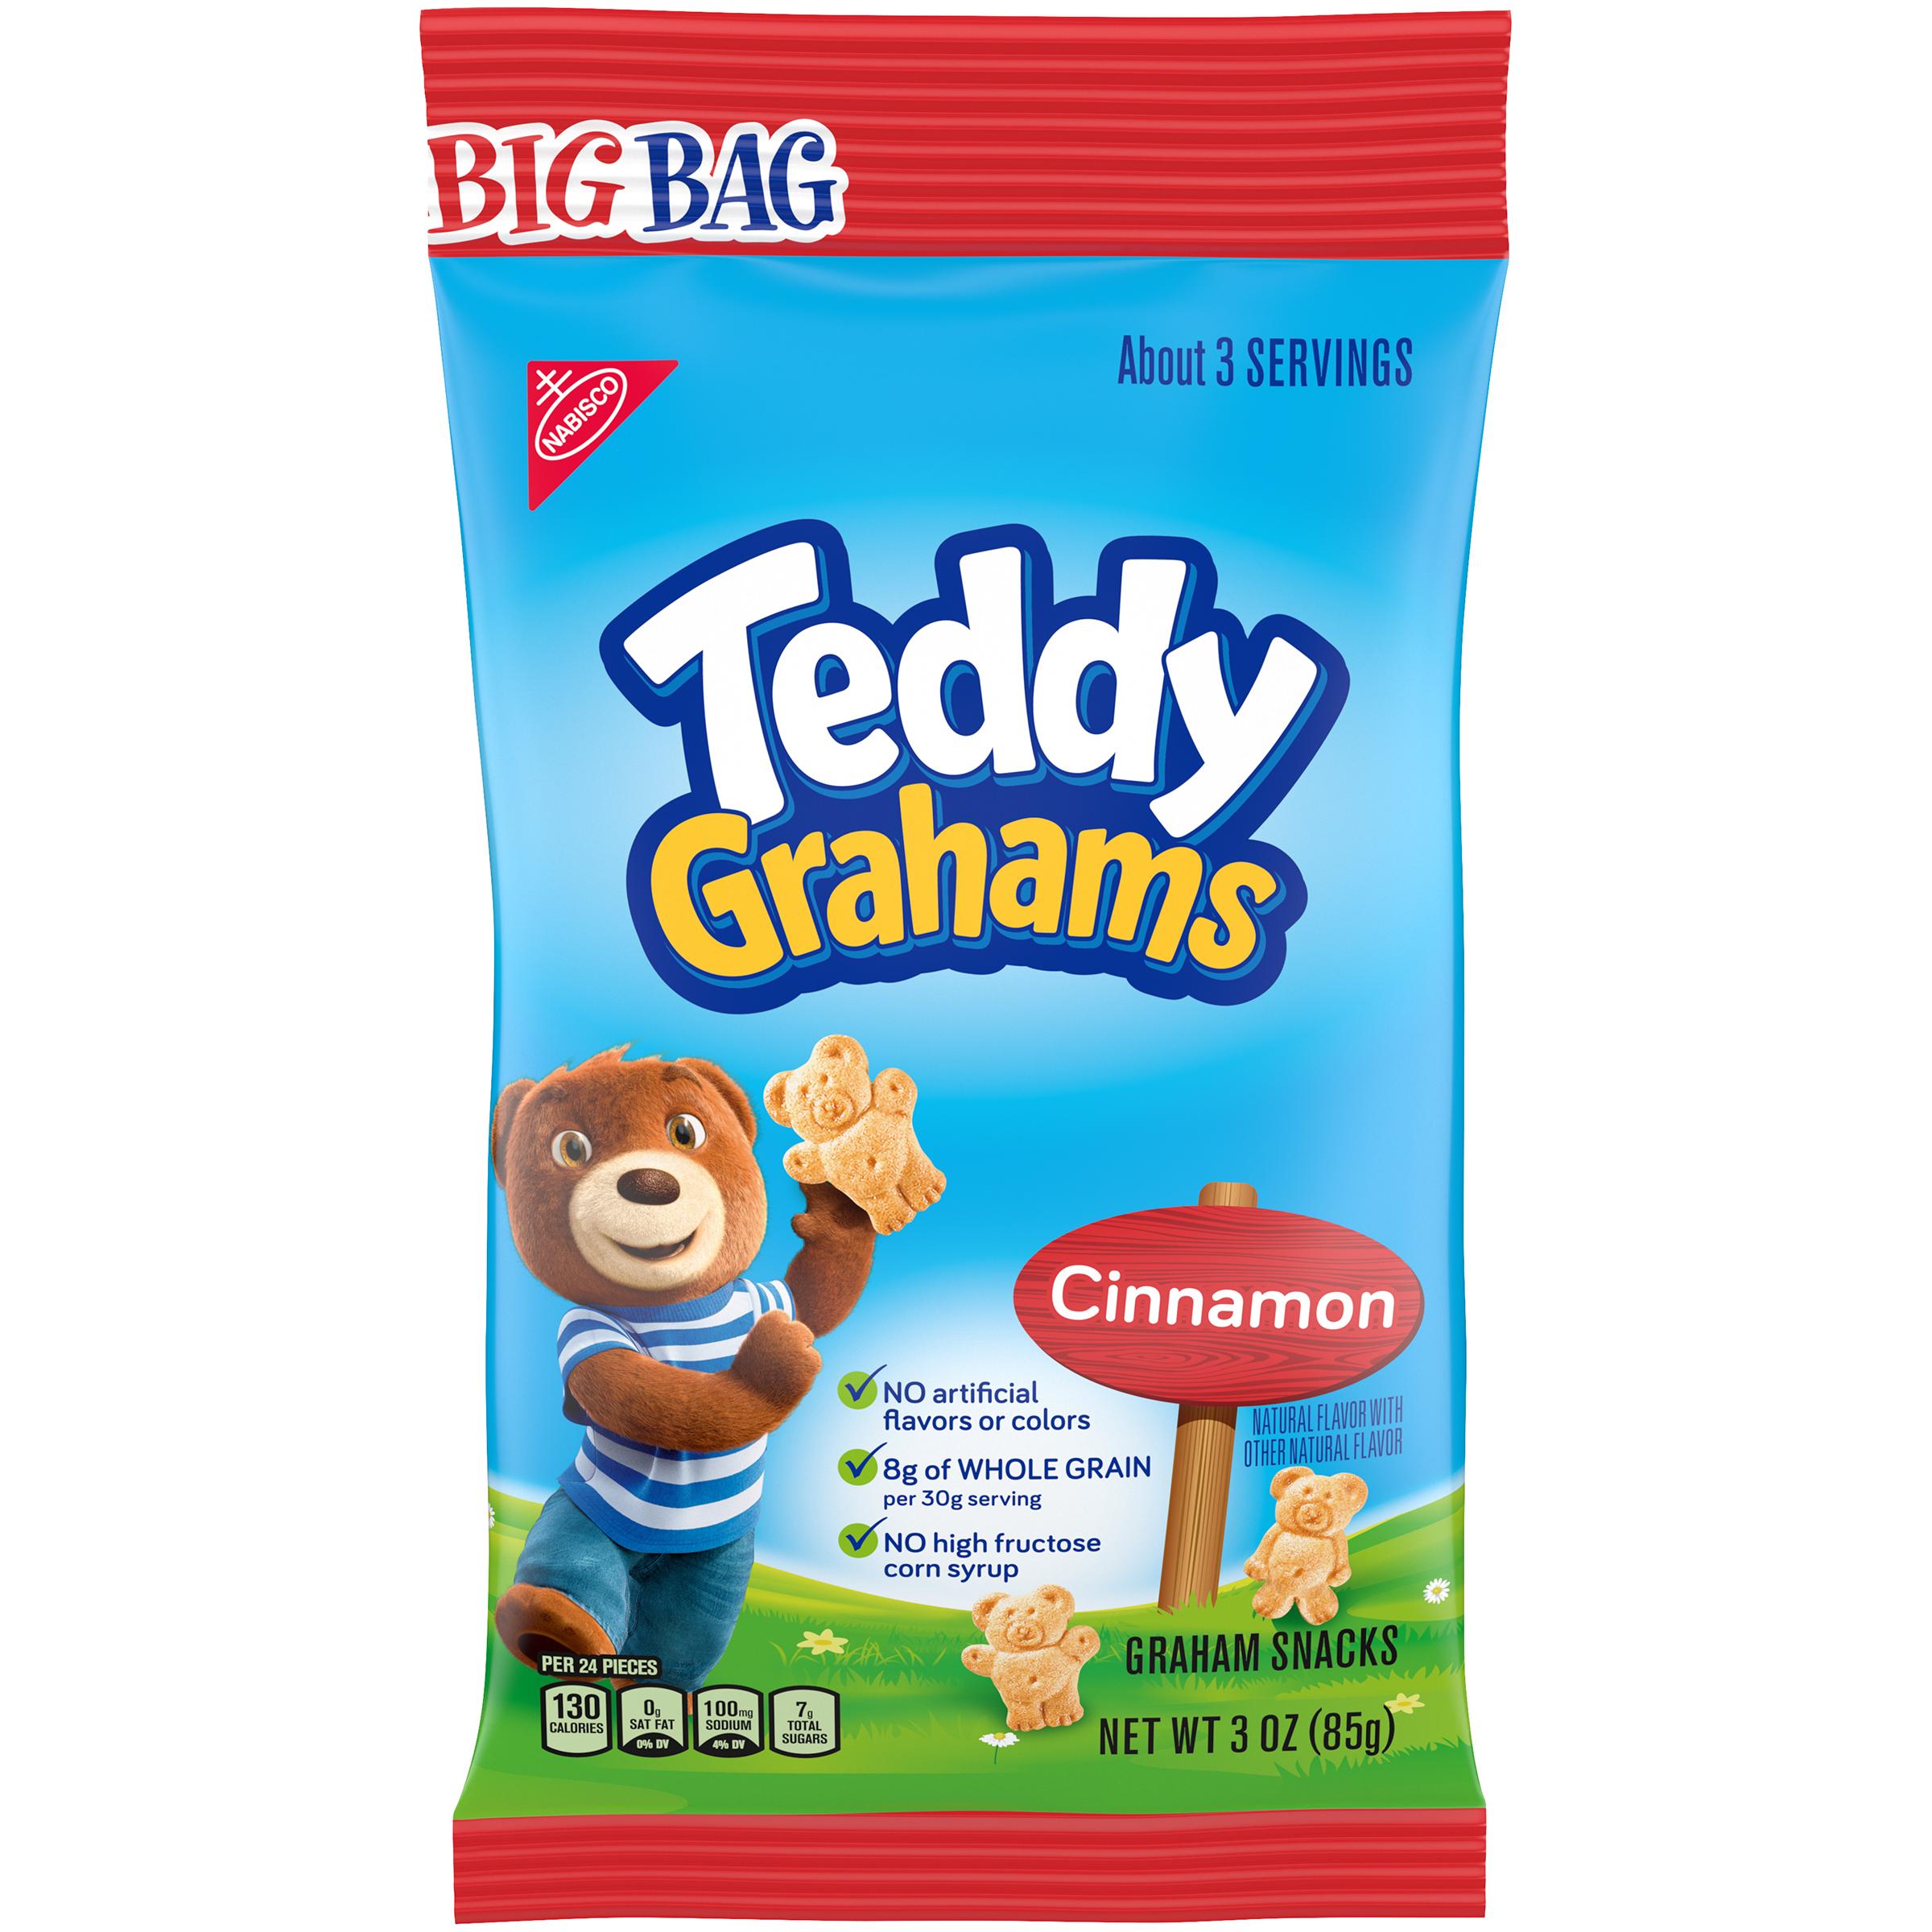 TEDDY GRAHAMS Cinnamon Lunchbox Cookies 3 oz